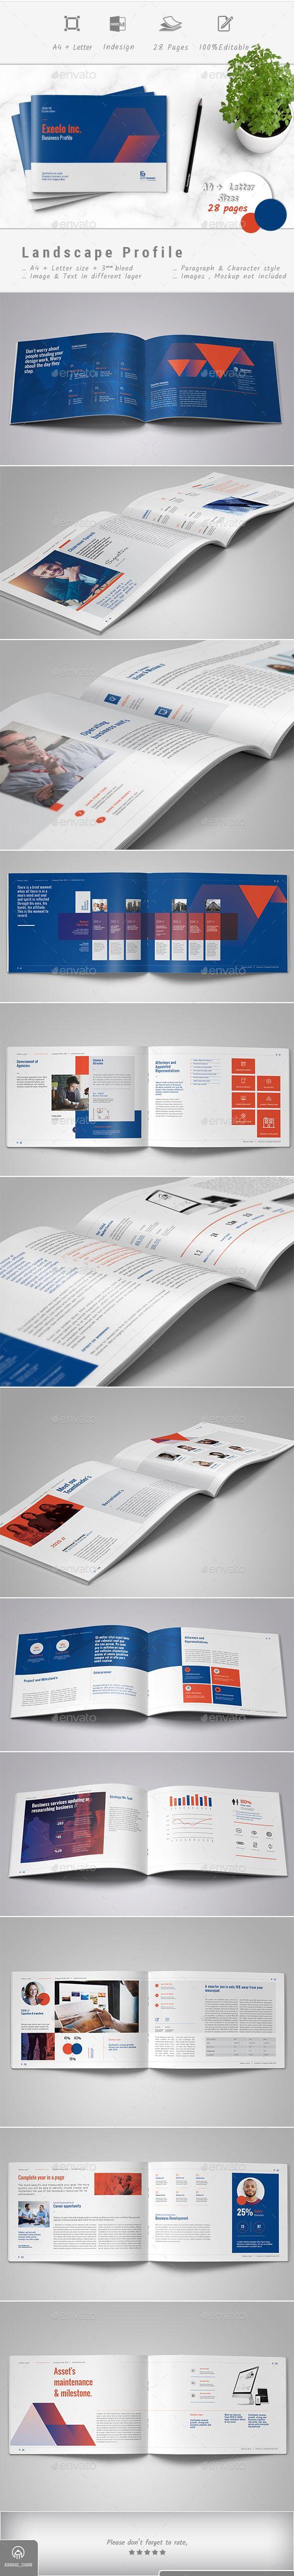 Landscape Company #Profile - #Corporate #Brochures Download here: https://graphicriver.net/item/landscape-company-profile/20133082?ref=alena994